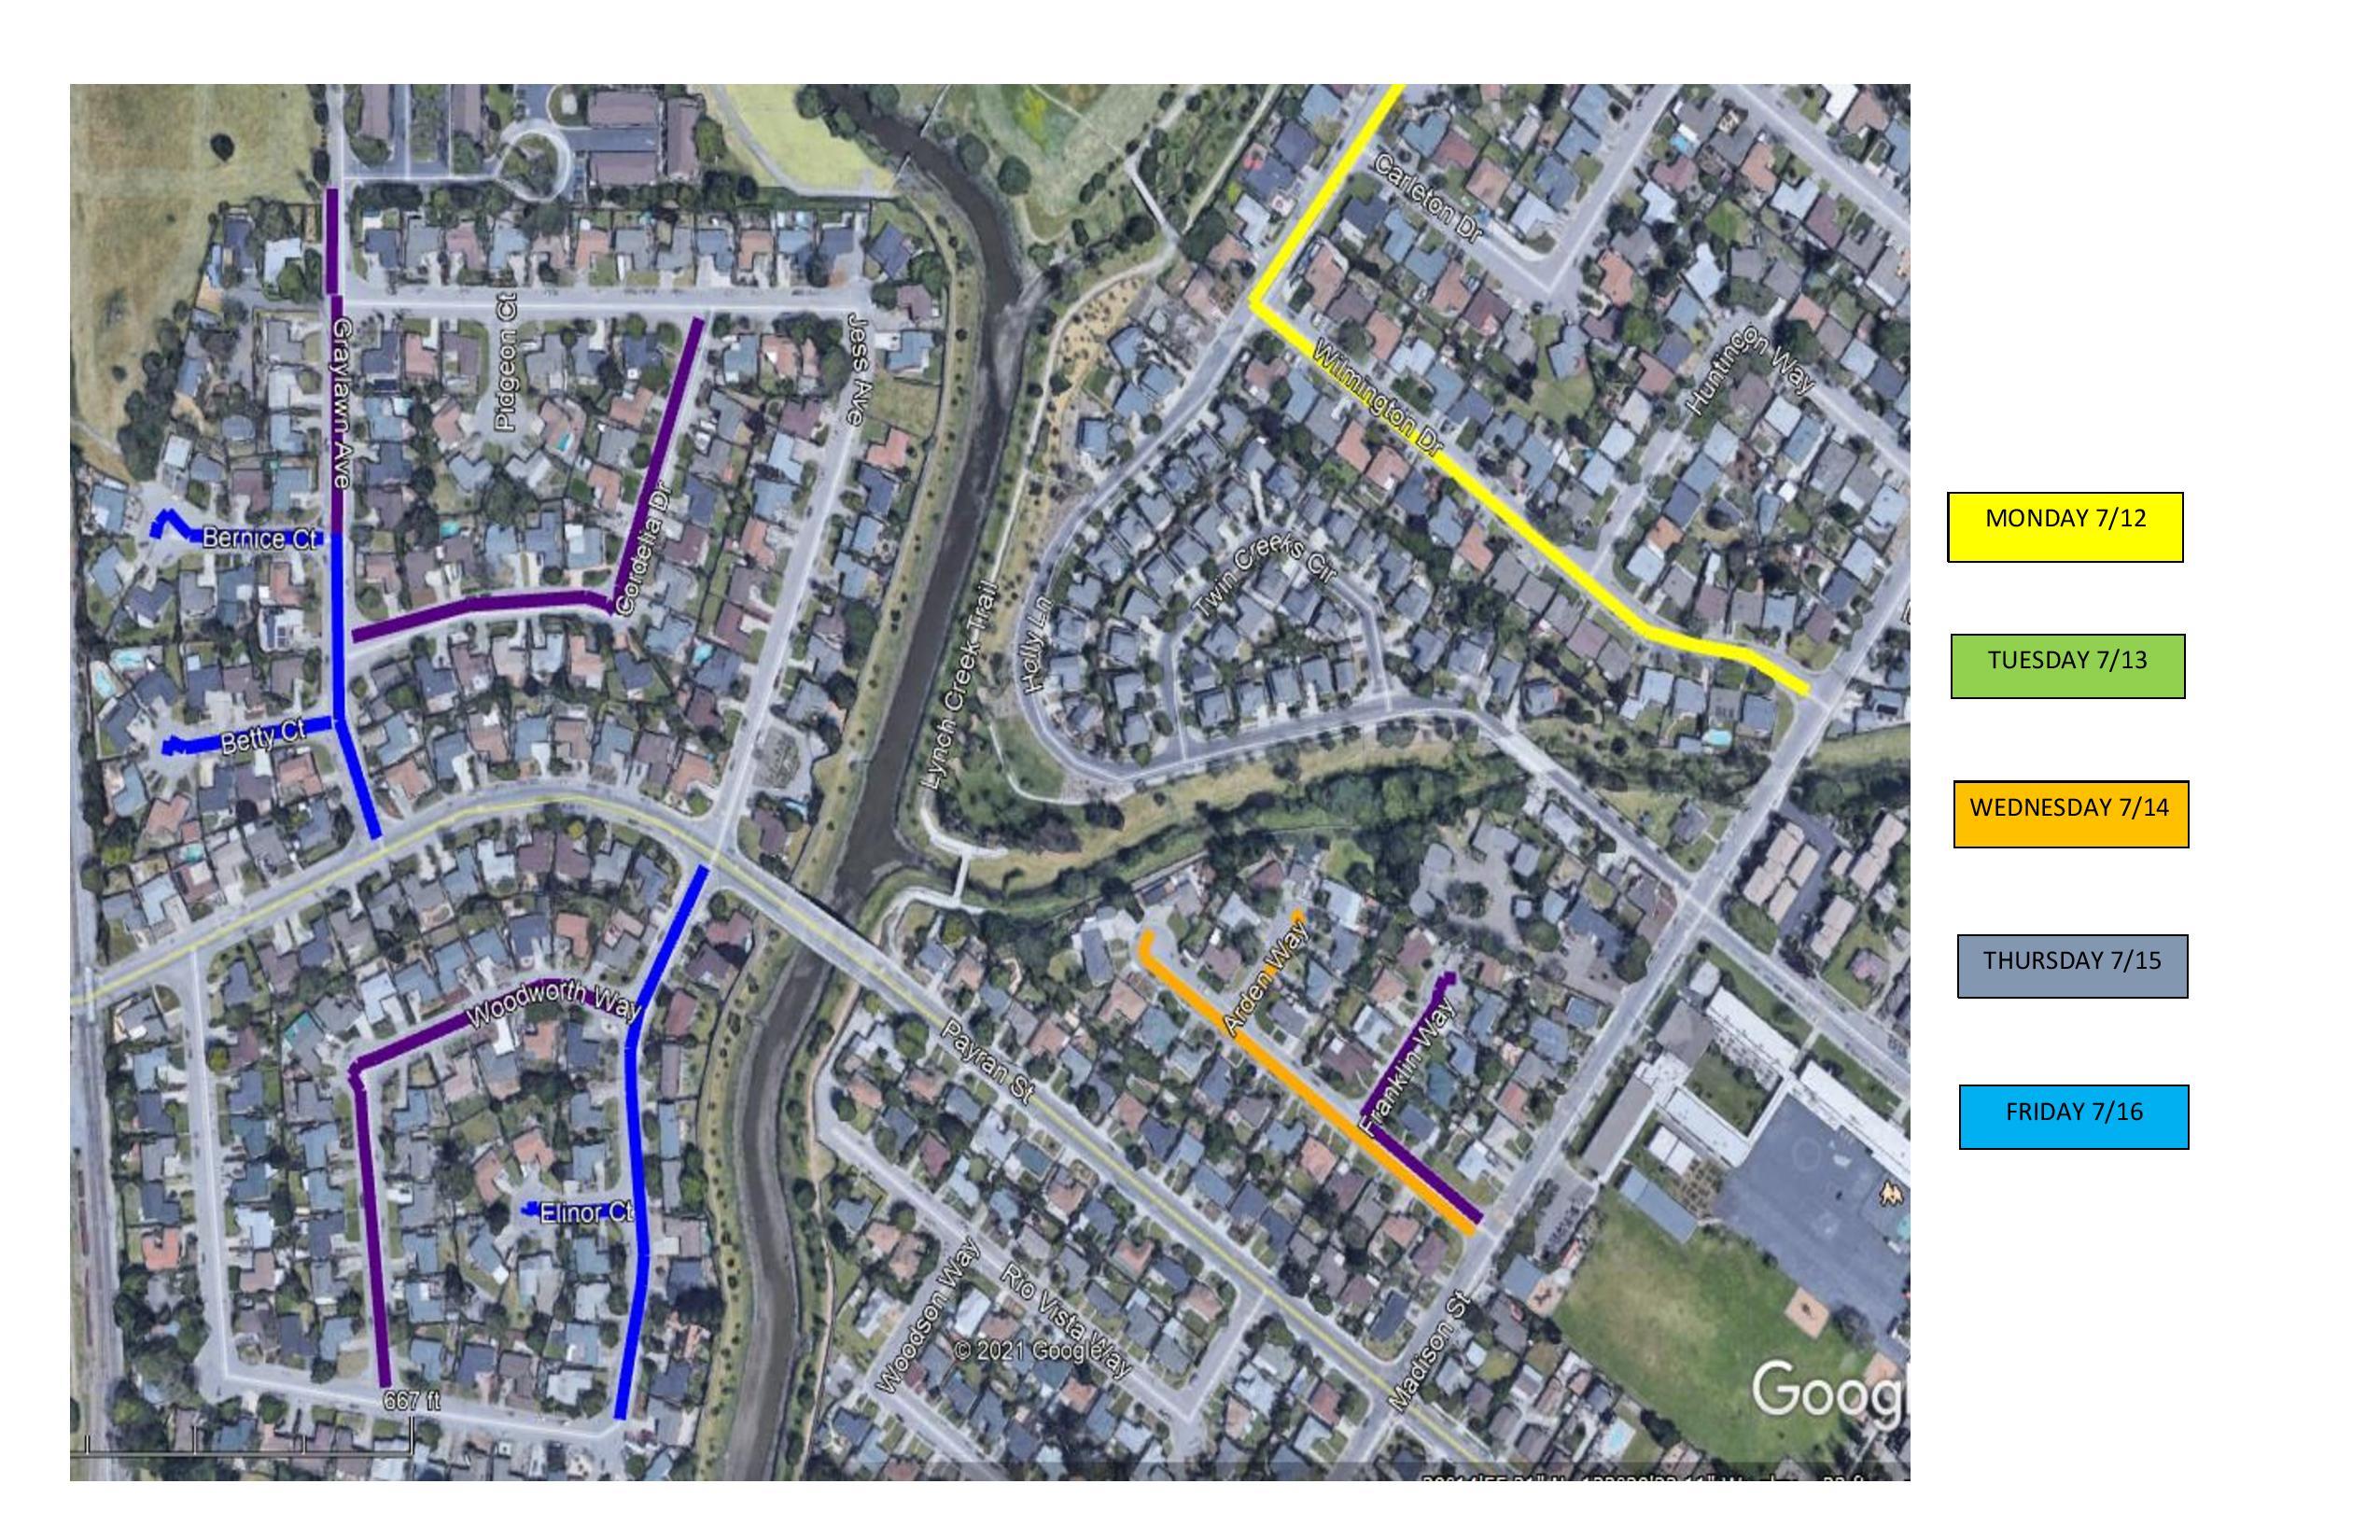 Pavement Map 4 7_12 thru 7_16